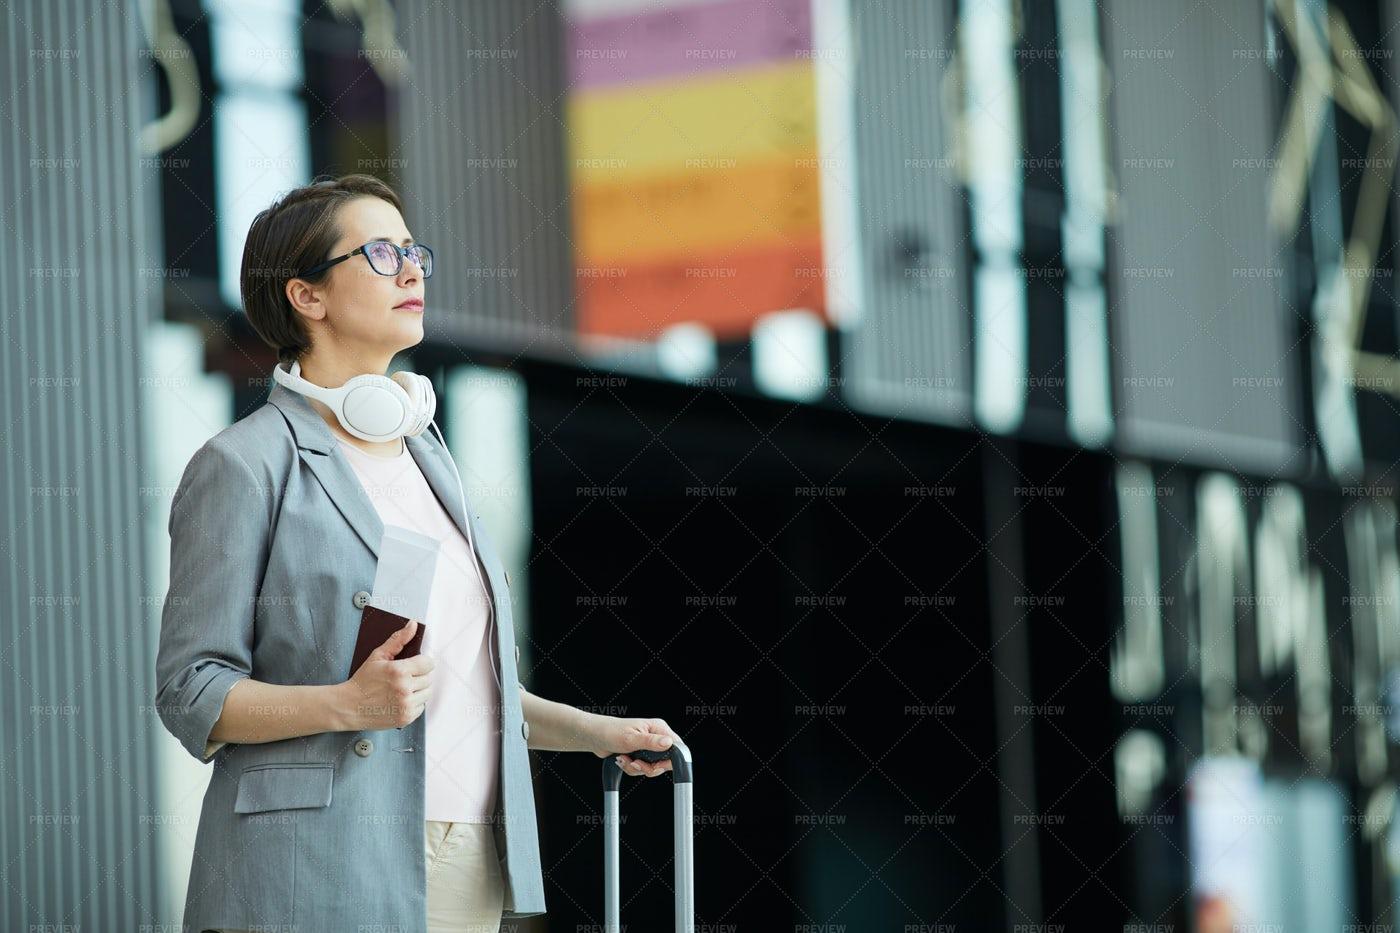 Modern Woman Reading Flight...: Stock Photos